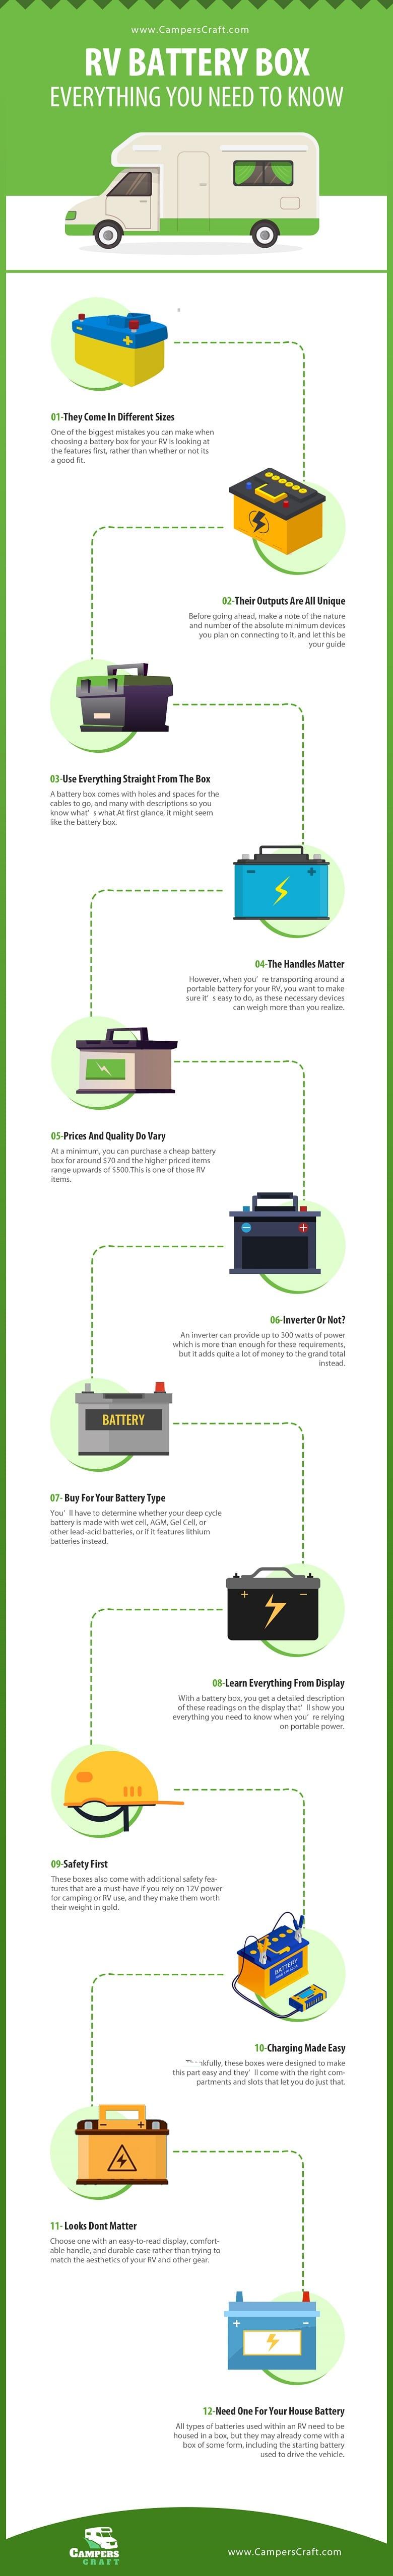 RV Battery Box